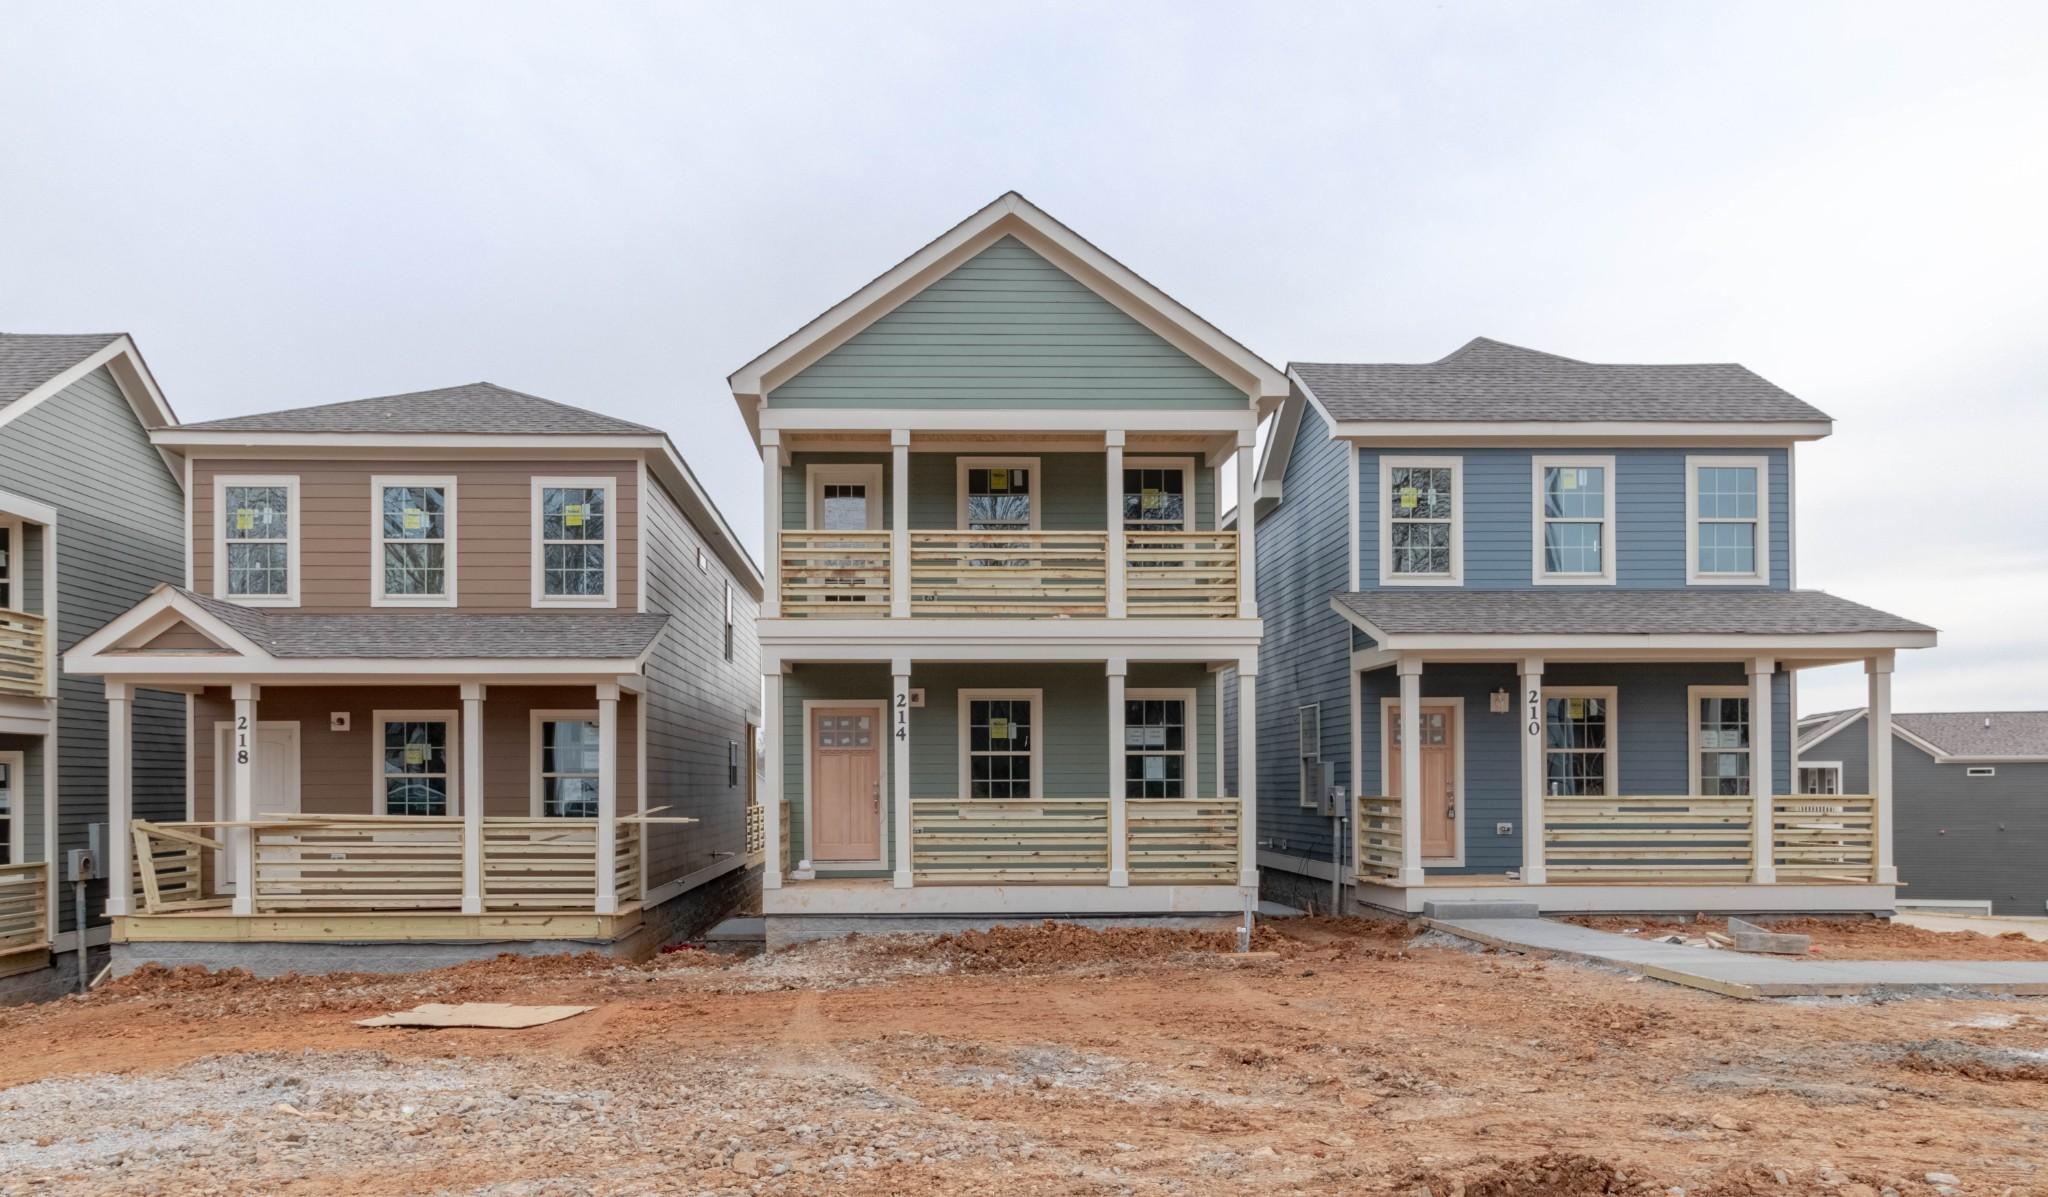 214 Jasmine Row, Ashland City, TN 37015 - Ashland City, TN real estate listing